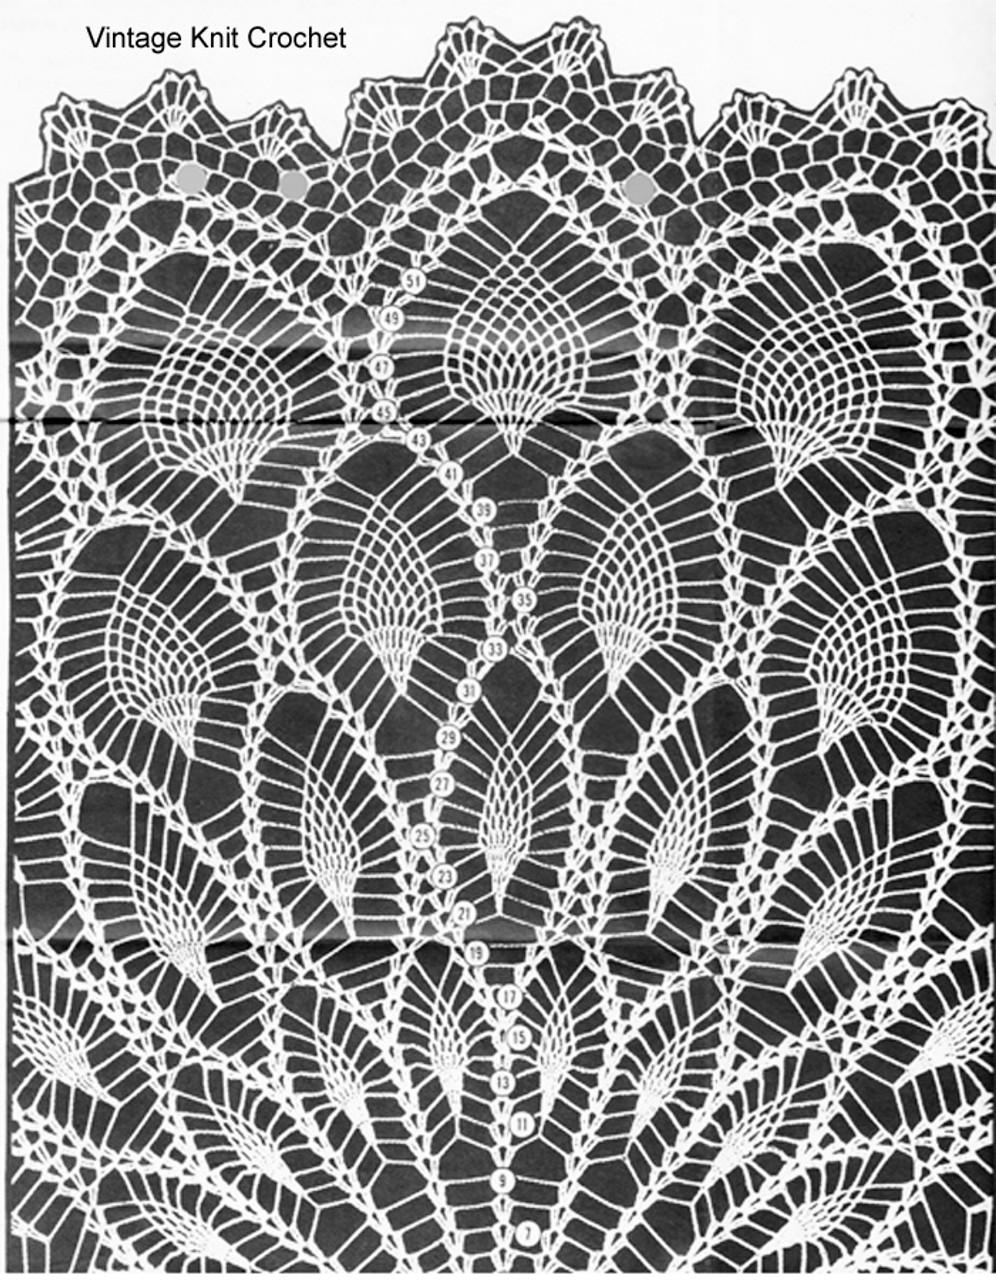 Round Pineapple Cloth Crochet Illustration, Design 845